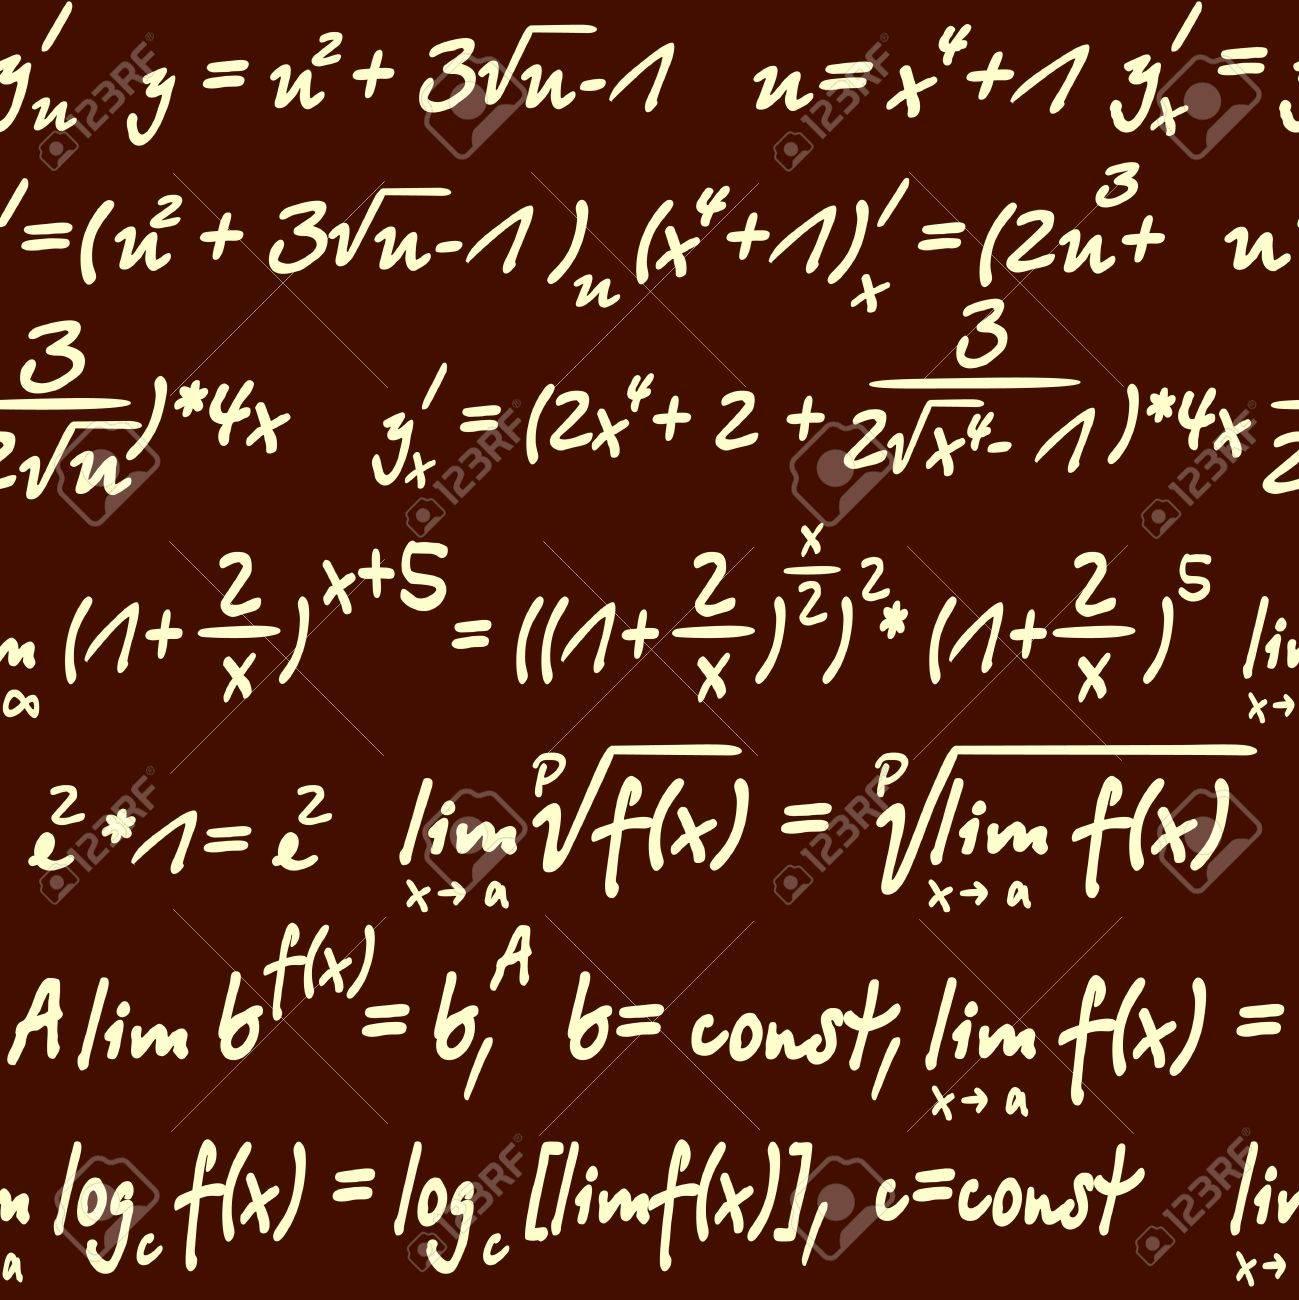 Science seamless with mathematics symbols for background or science seamless with mathematics symbols for background or wallpaper design stock vector 12306852 biocorpaavc